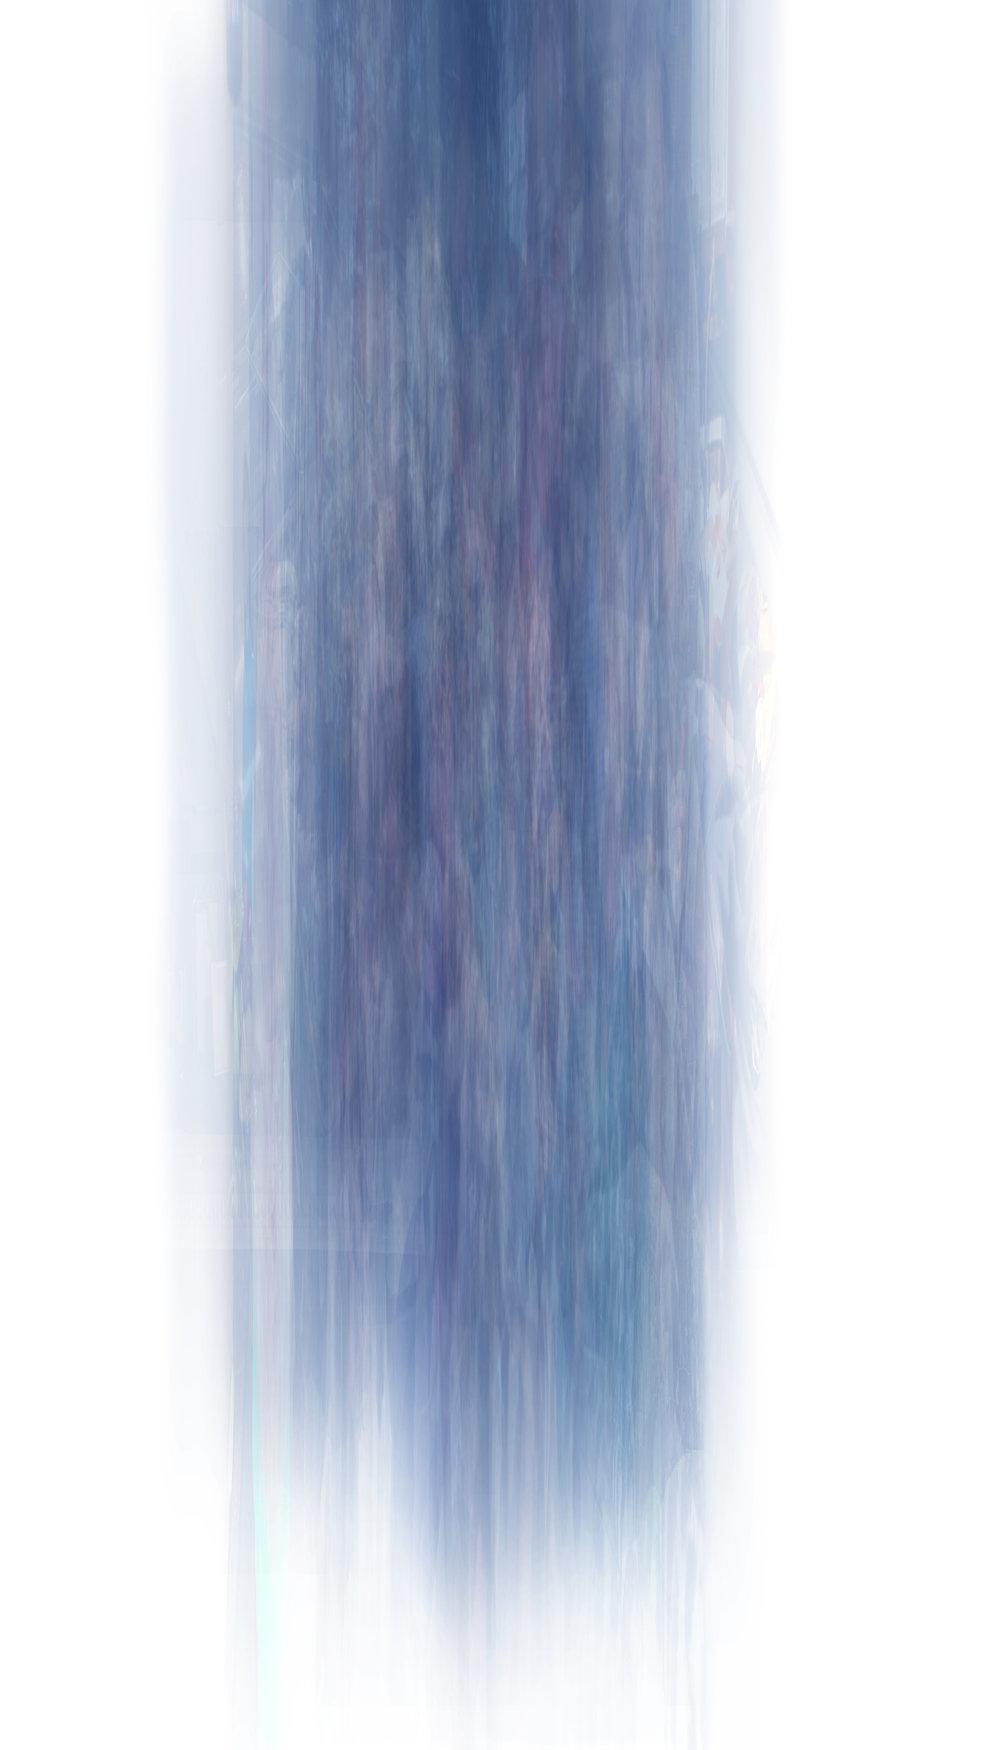 "Eroding History 3  Archival Pigment Print  63"" x 36"", 2018."